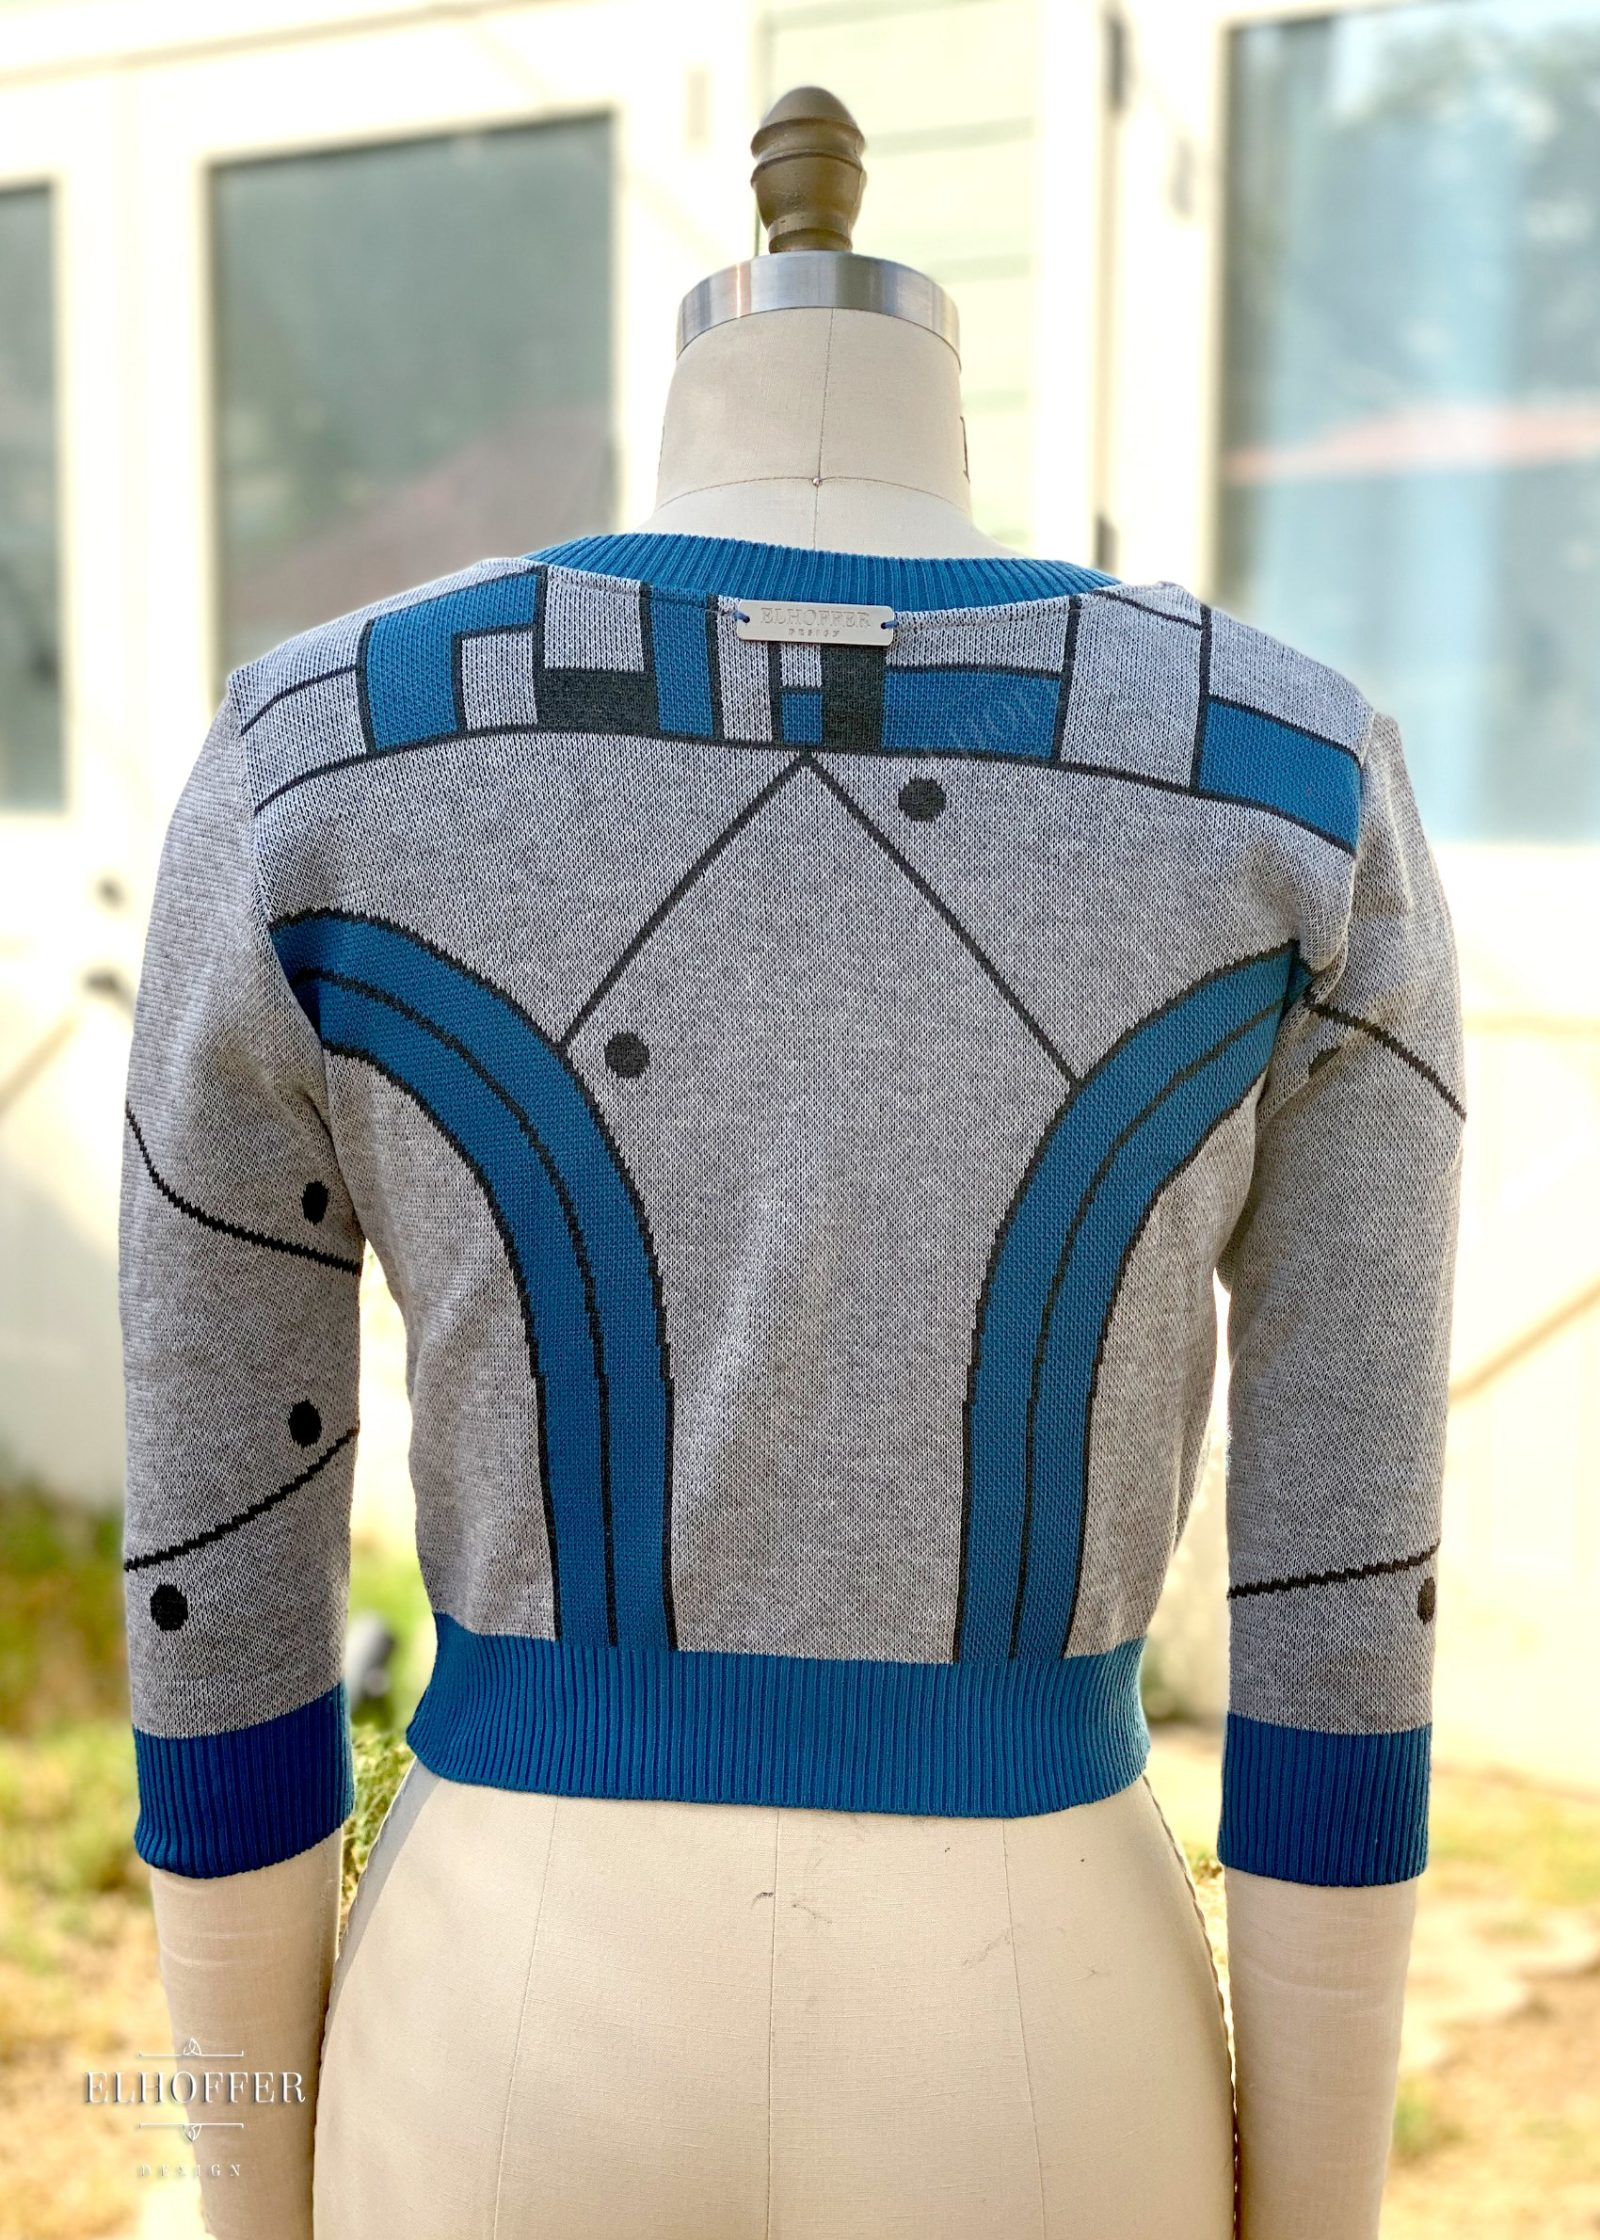 Elhoffer Design - Star Wars Inspired Galactic Baby Bot Blue Cardigan